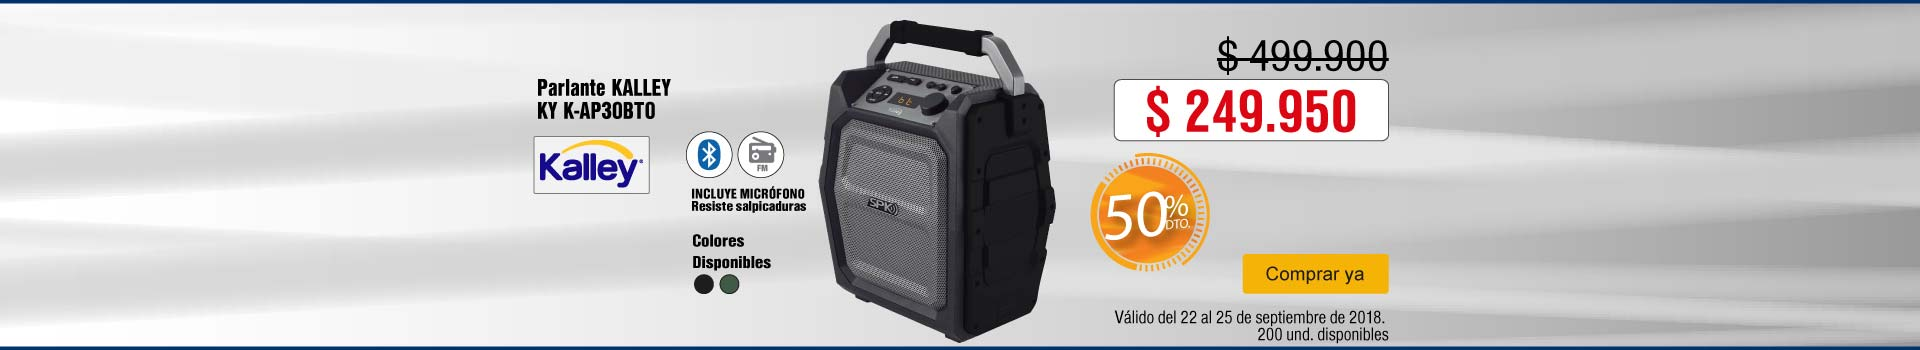 AK-KT-BCAT-6-audio-PP---Kalley-K-AP30BTO-Sep22